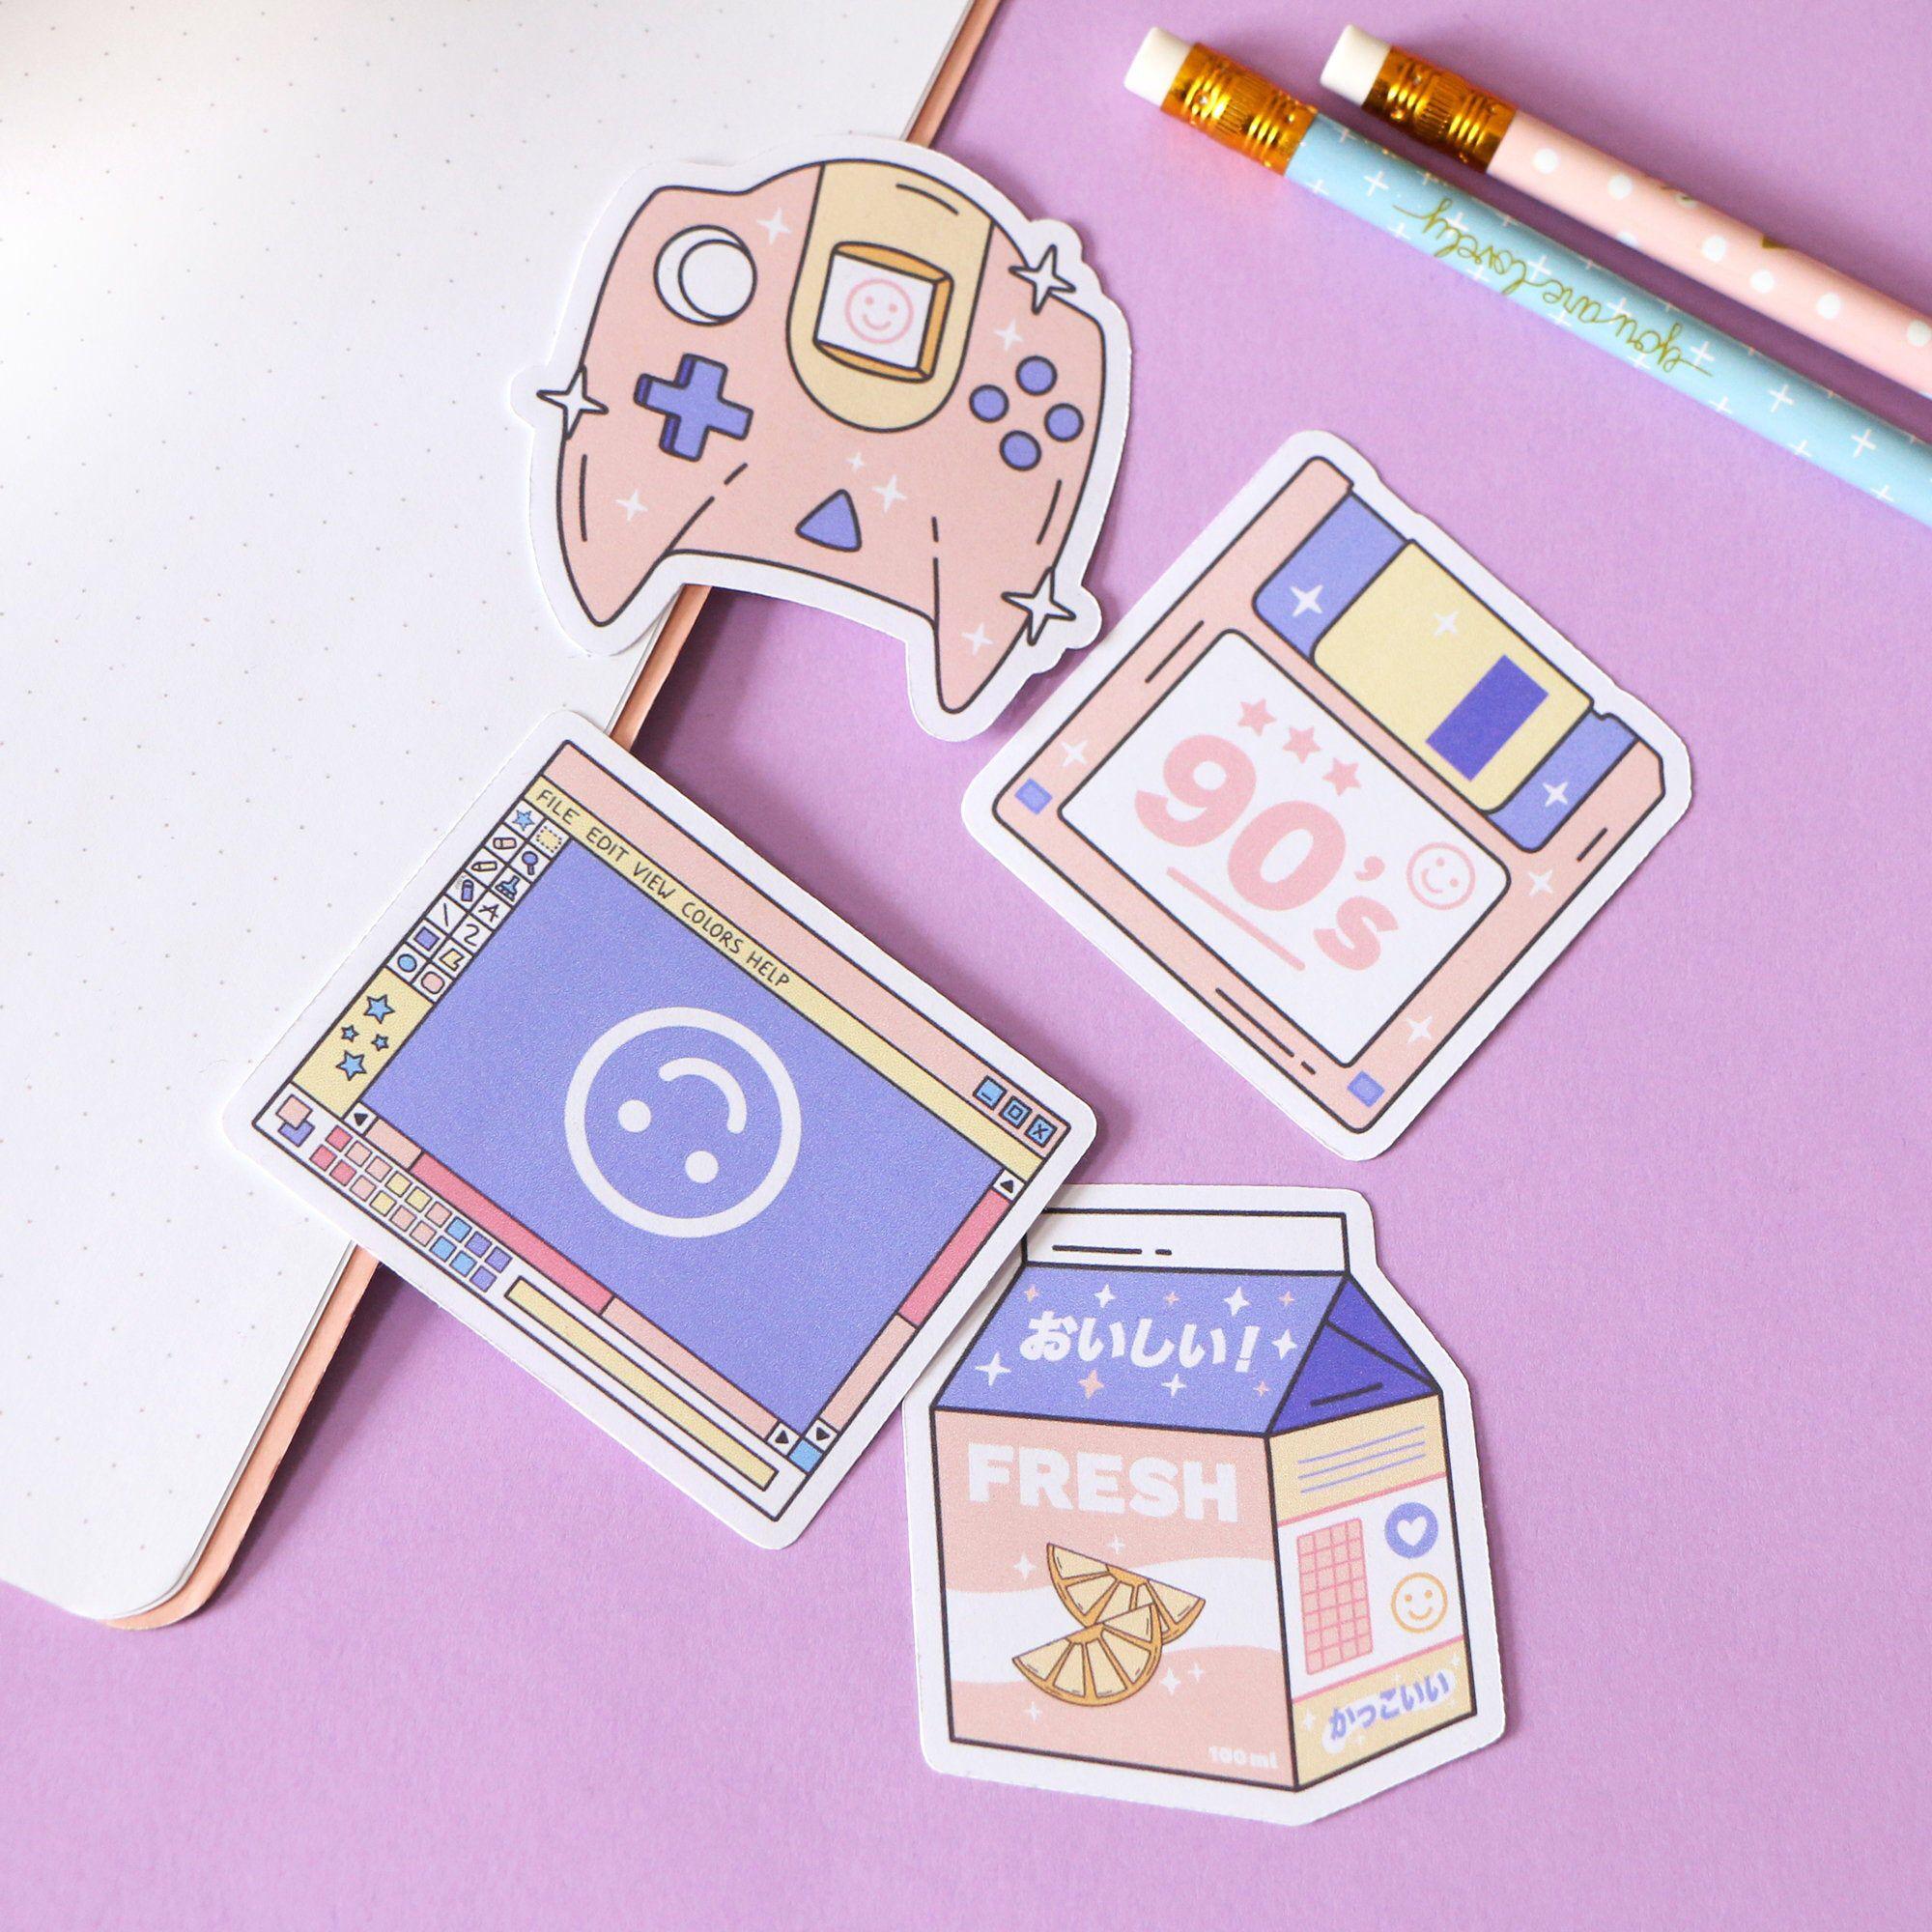 Vaporwave Inspiration Stickers Pastel Stickers Retro Stickers The